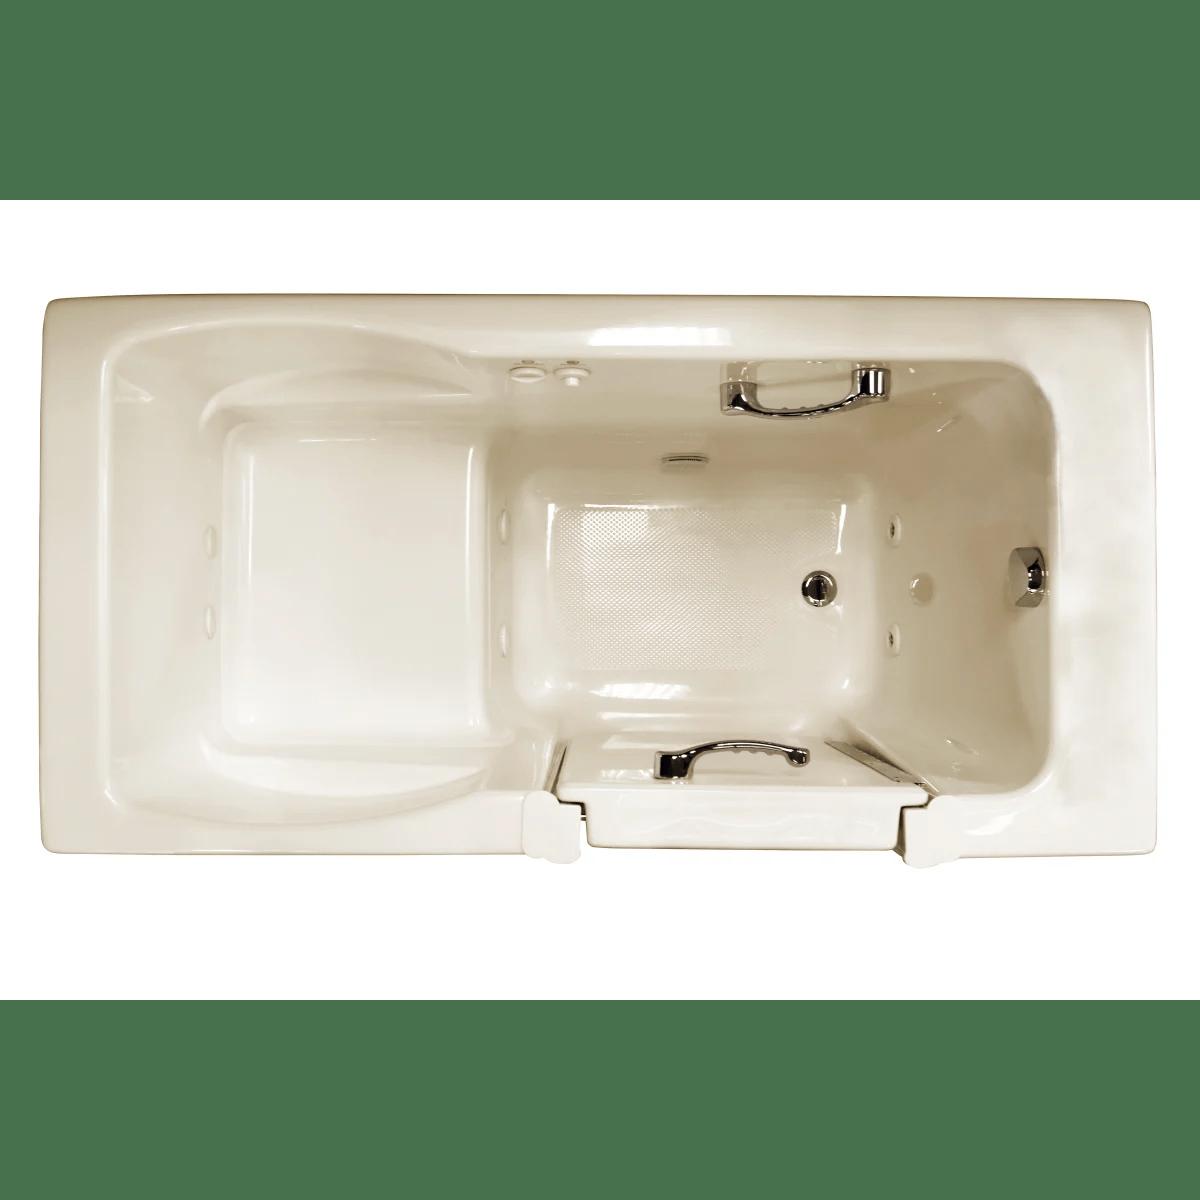 Jacuzzi Fin6036wrl1hxw White Finestra 60 Whirlpool Walk In